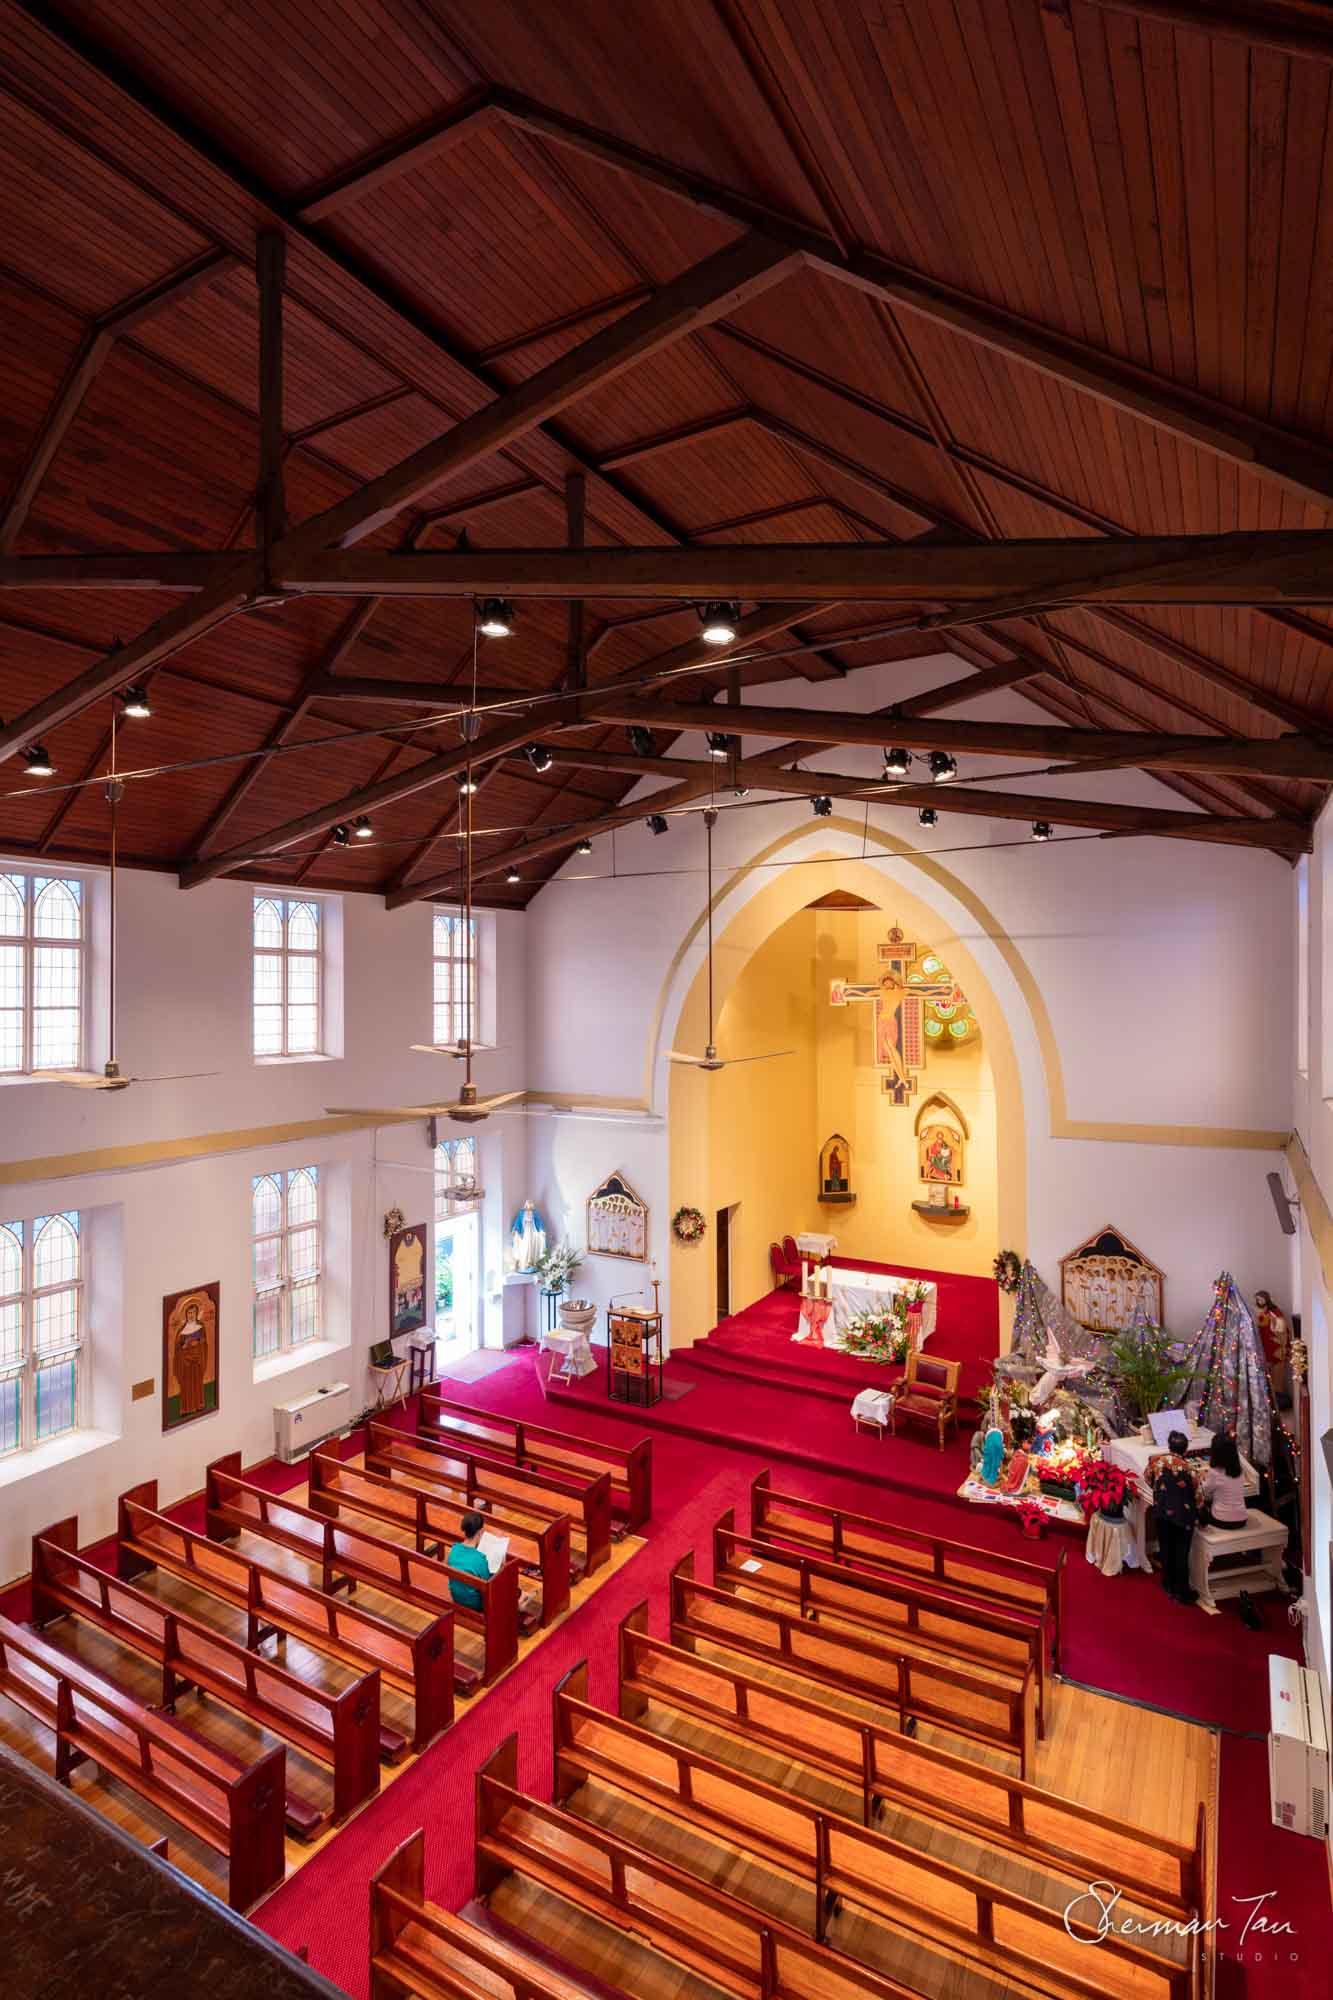 ©Sherman Tan Studio_Best Melbourne Wedding Church Venue_All Saints Church-064.jpg